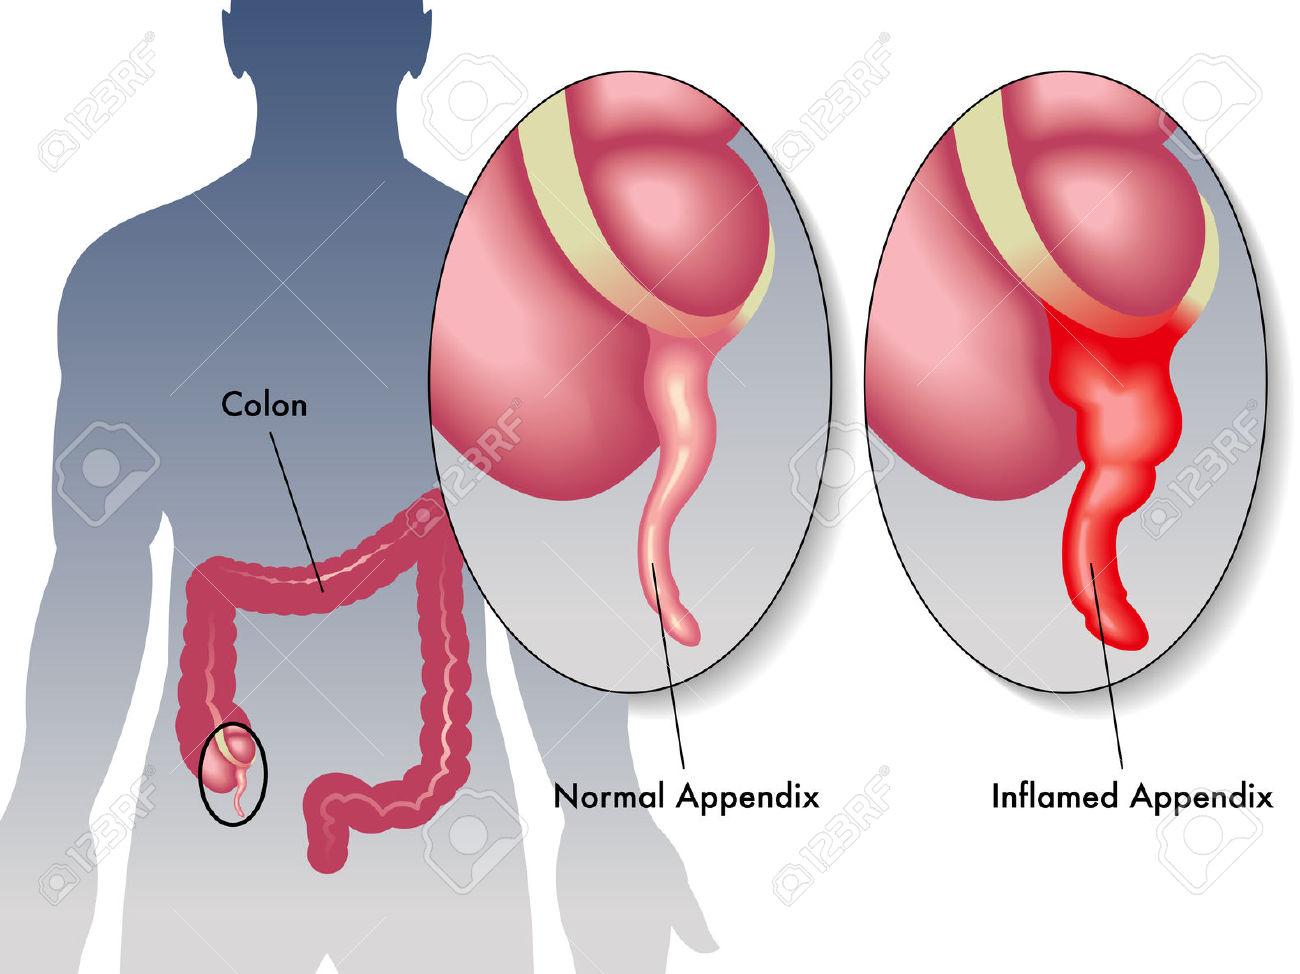 Salud Cotidiana: Apendicitis